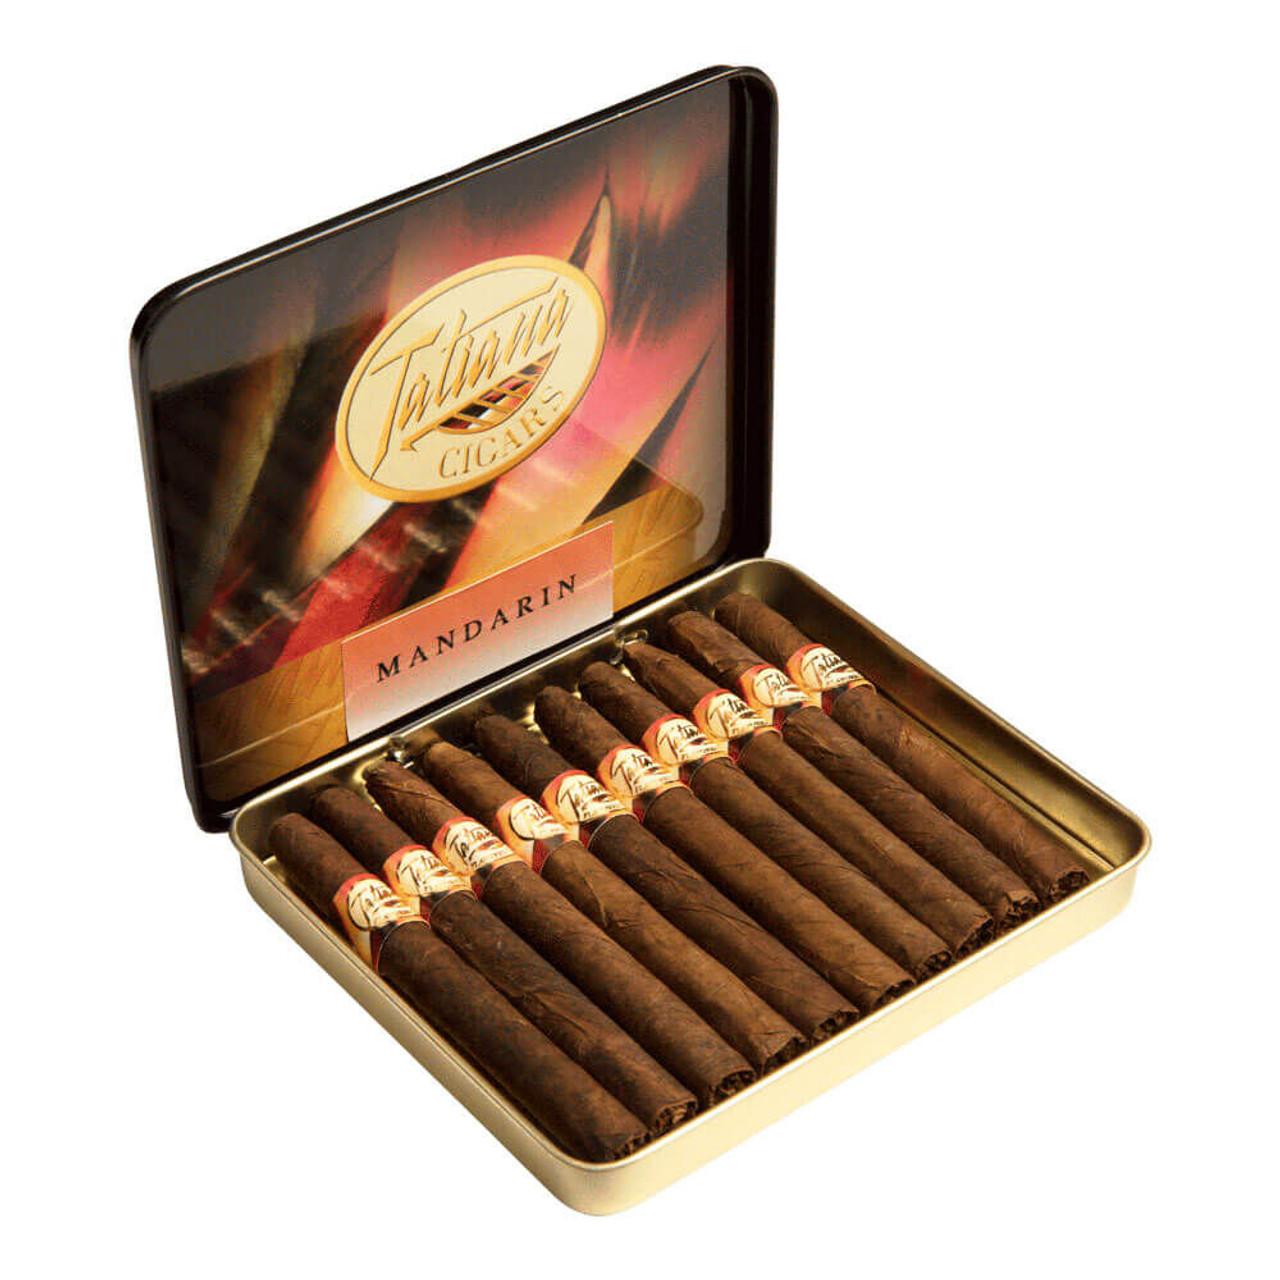 Tatiana Mini Tins Mandarin Cigars - 3.5 x 26 (5 Tins of 10 (50 total))